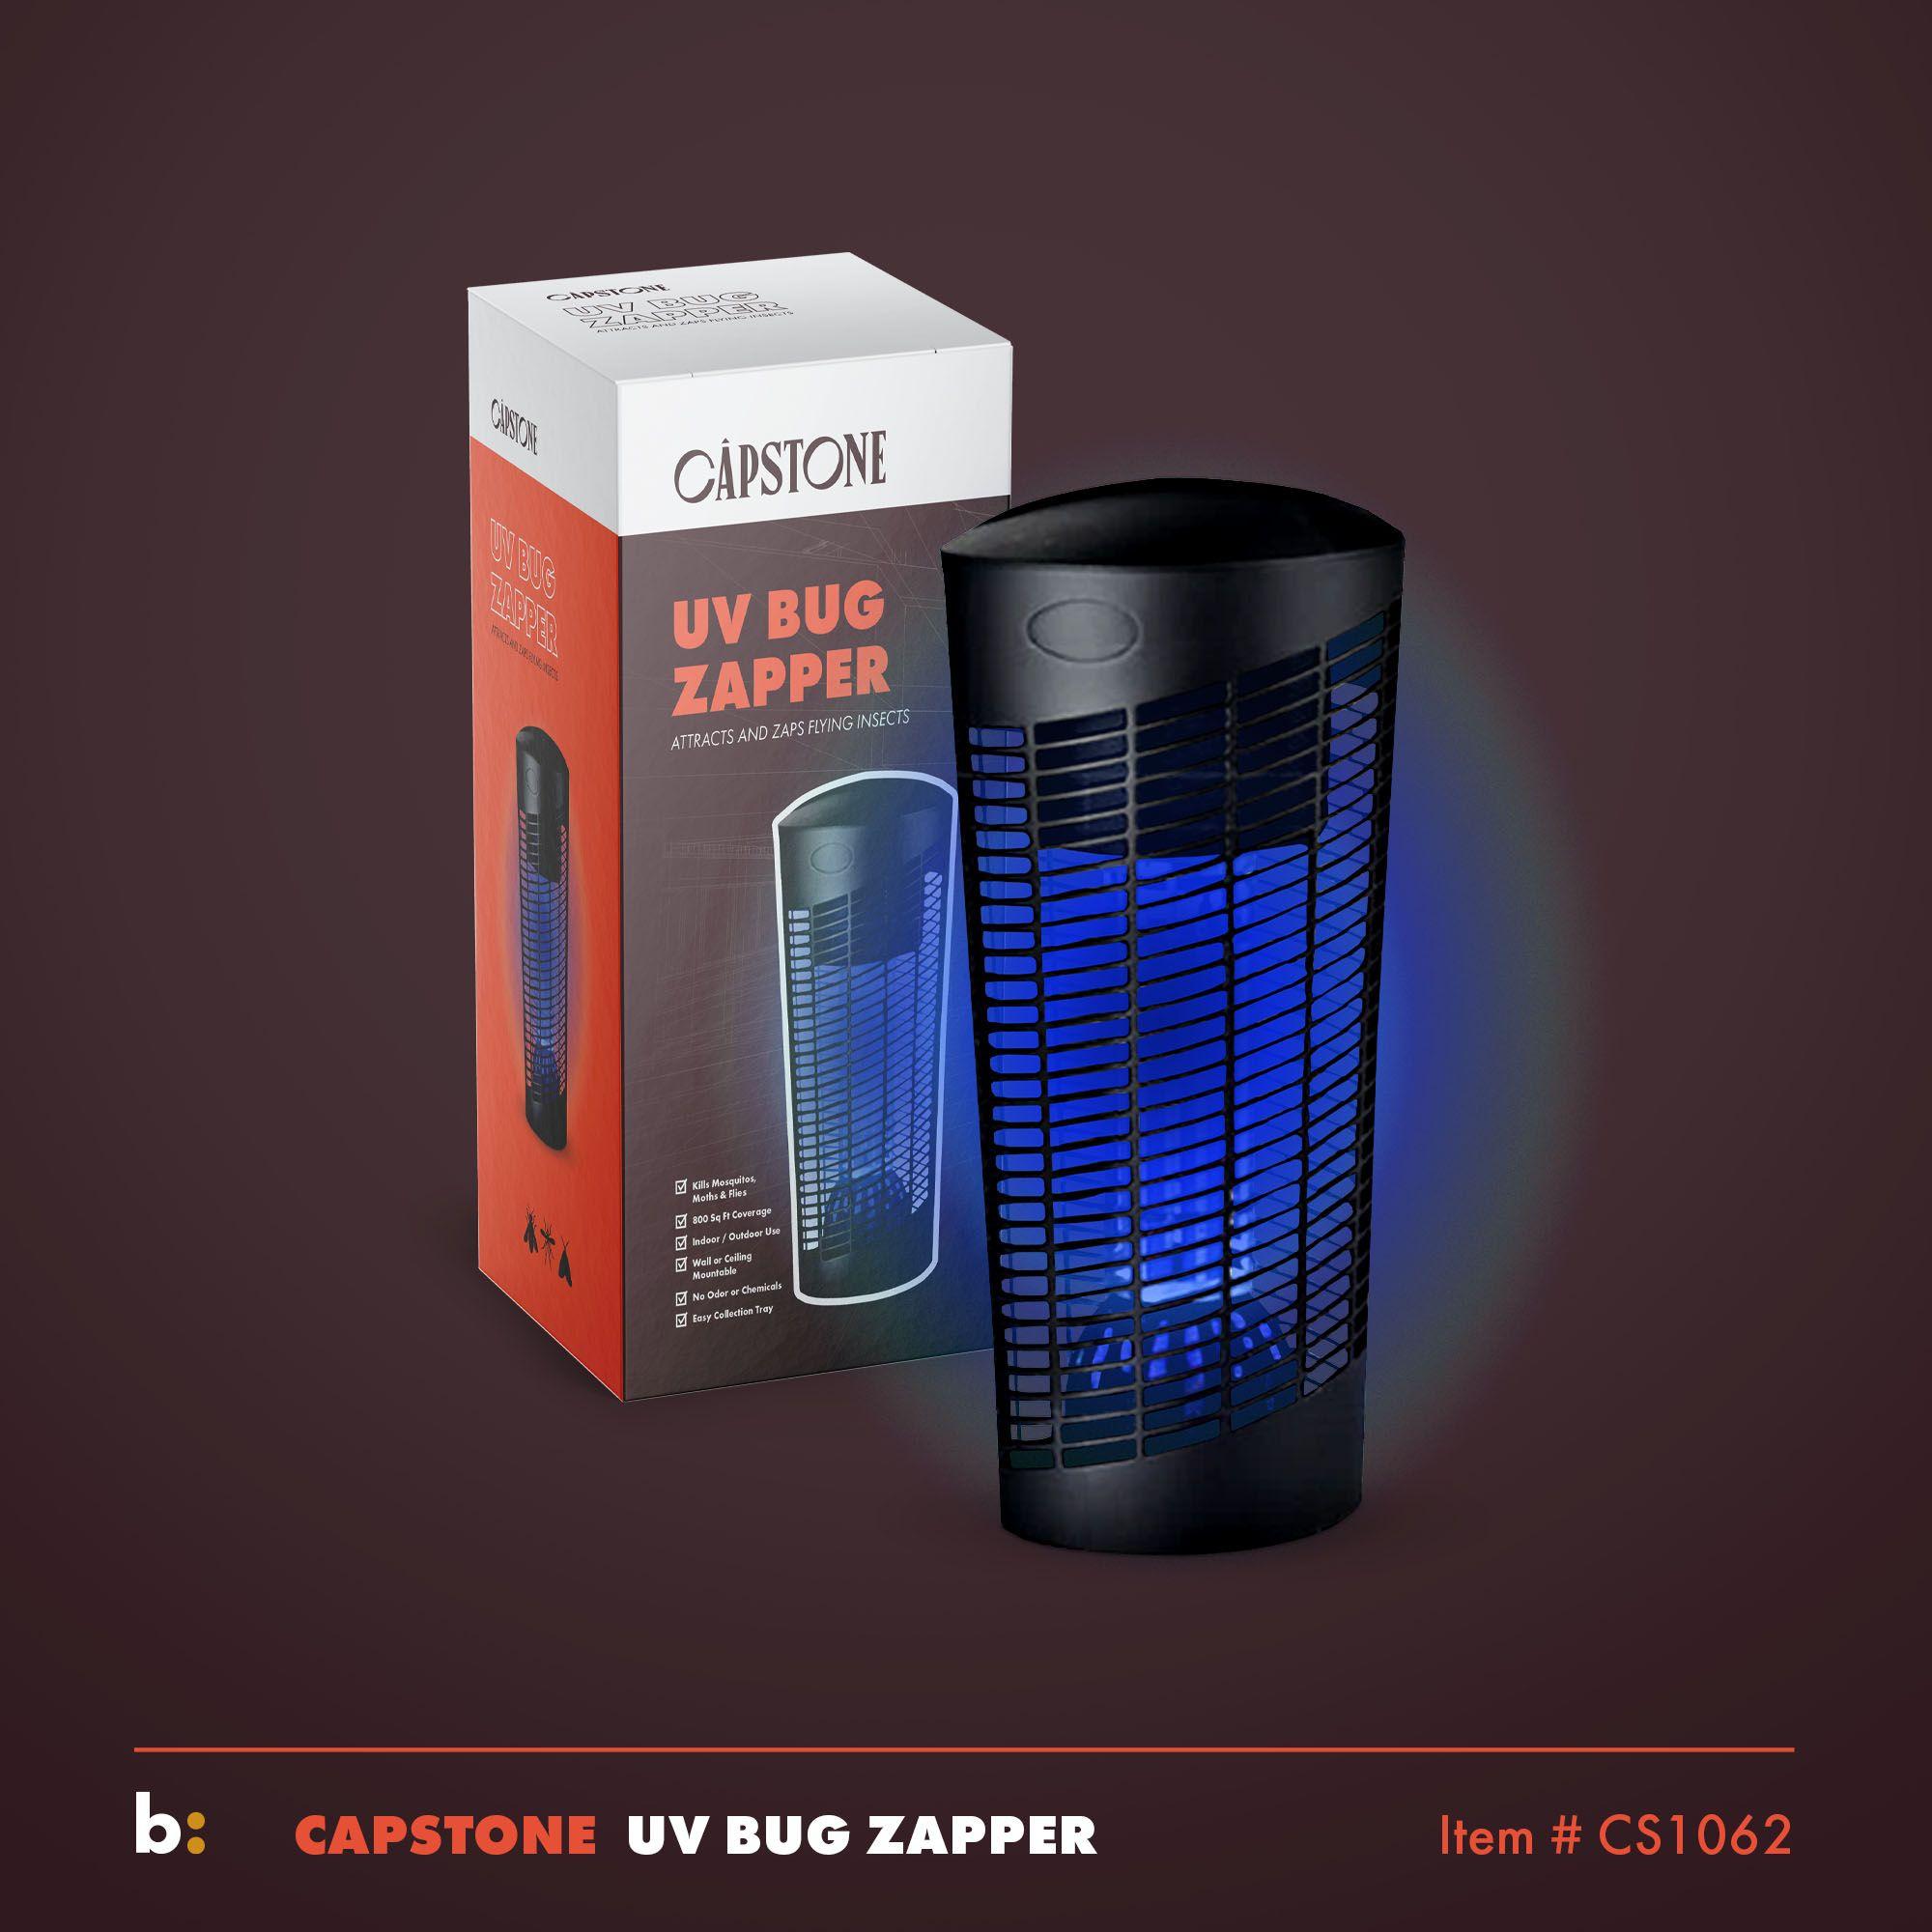 Brand Capstone Bug Zapper Cs1062 For Wholesale Inquires Casino Promotions Branding Design Services Pa In 2020 Service Design Branding Design Rebranding